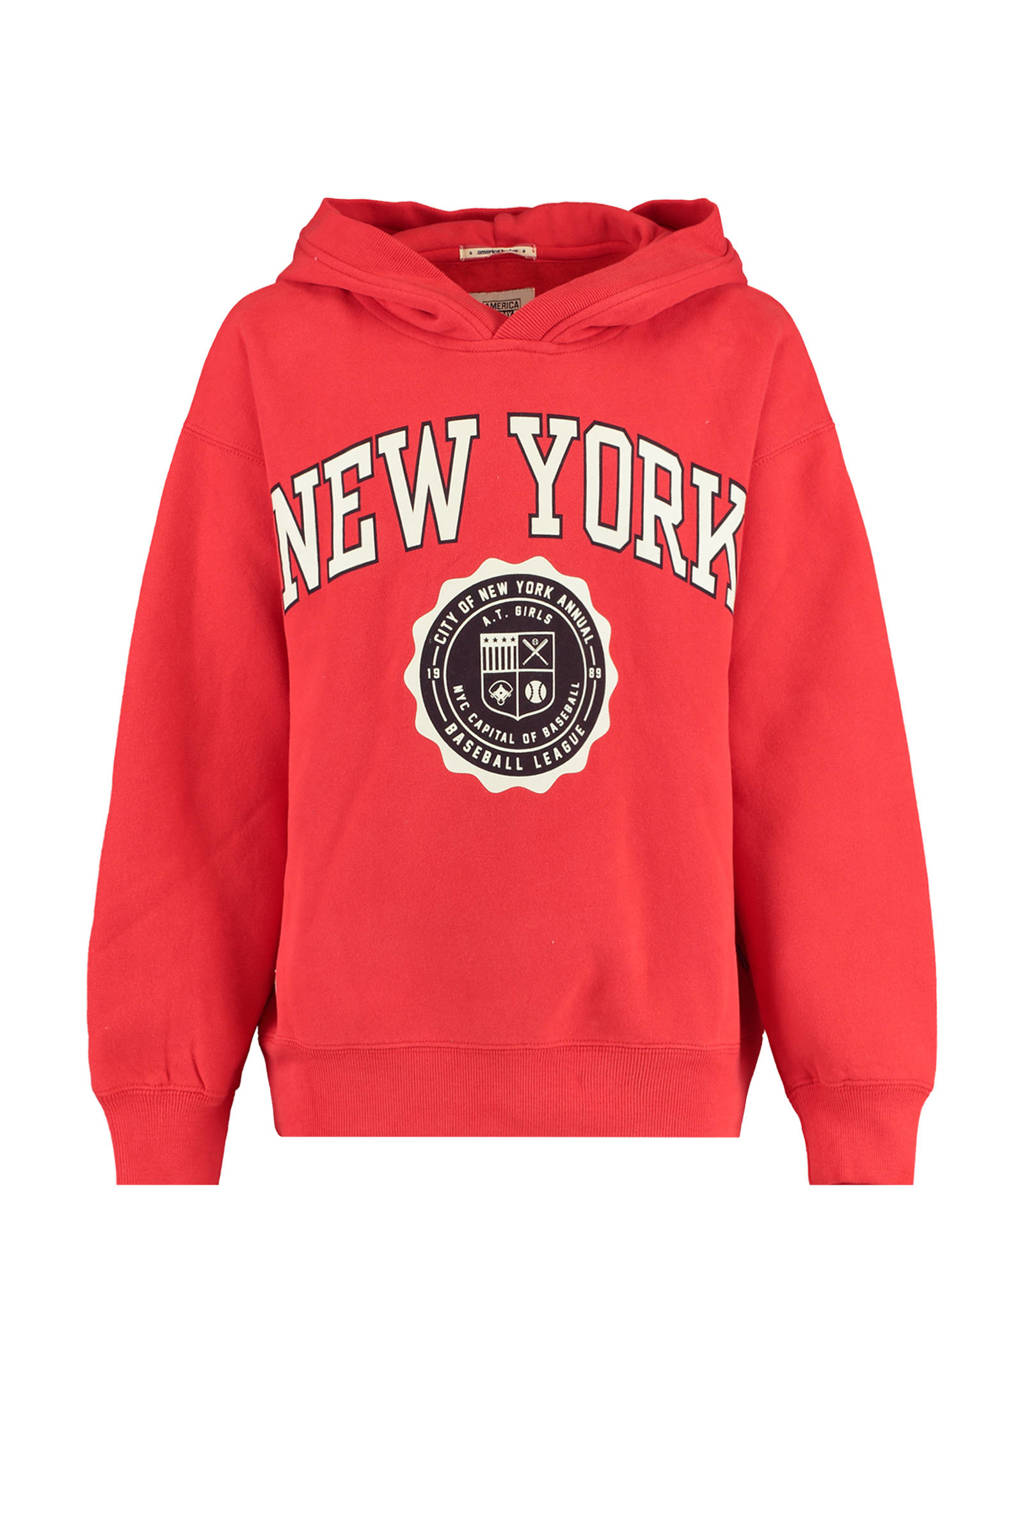 America Today Junior sweater met printopdruk rood, Rood